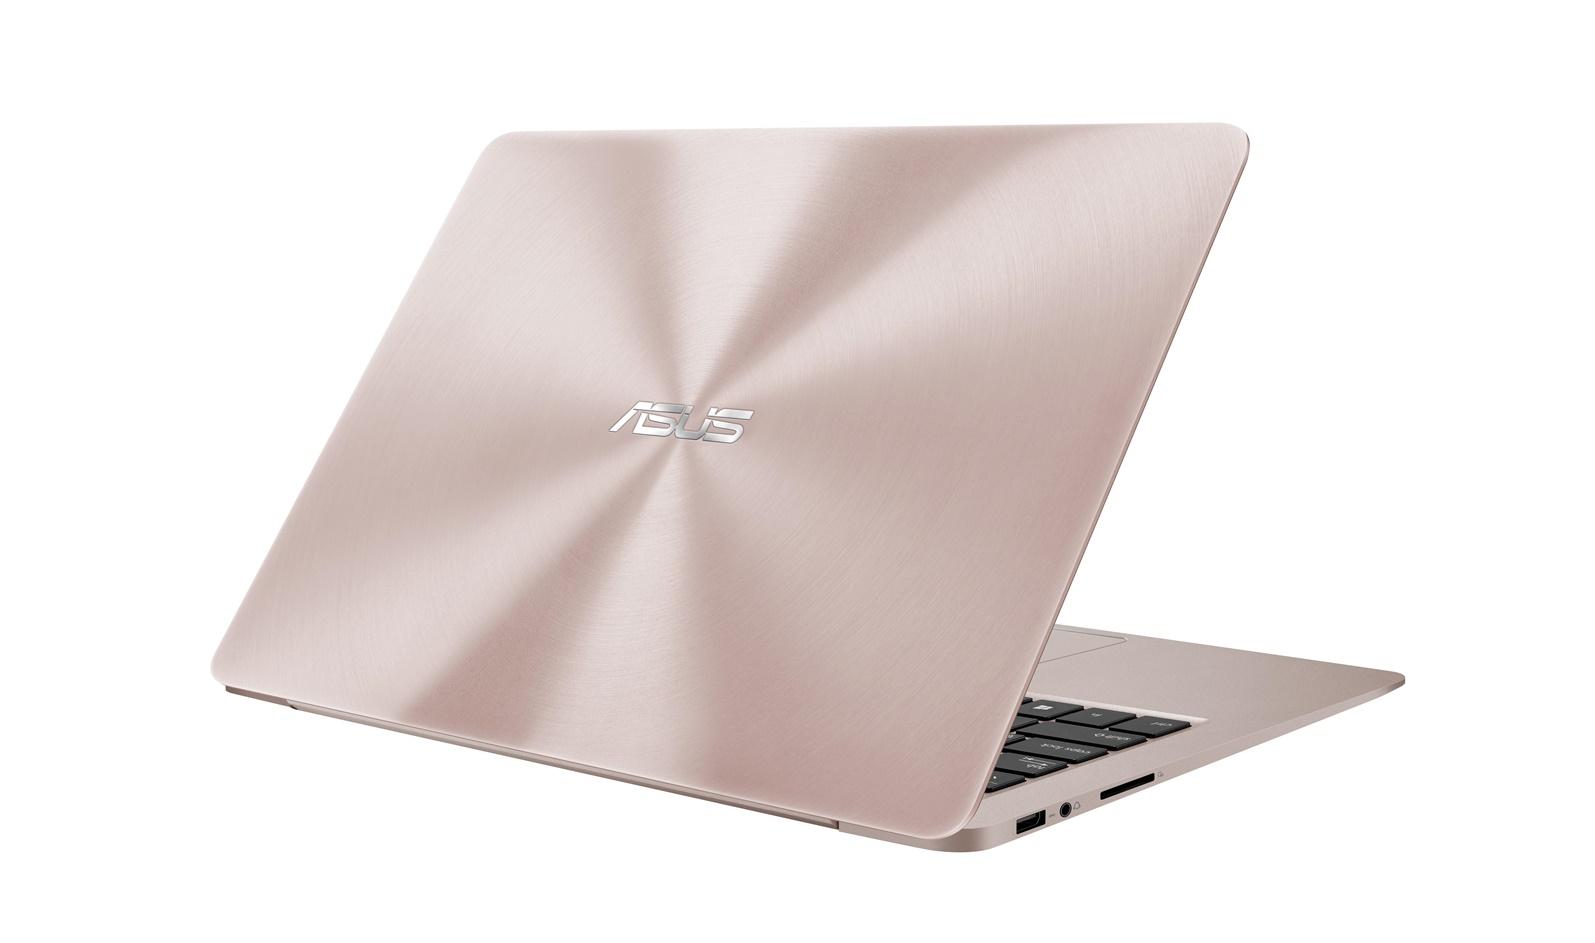 Preview Asus Zenbook UX303UA PCN